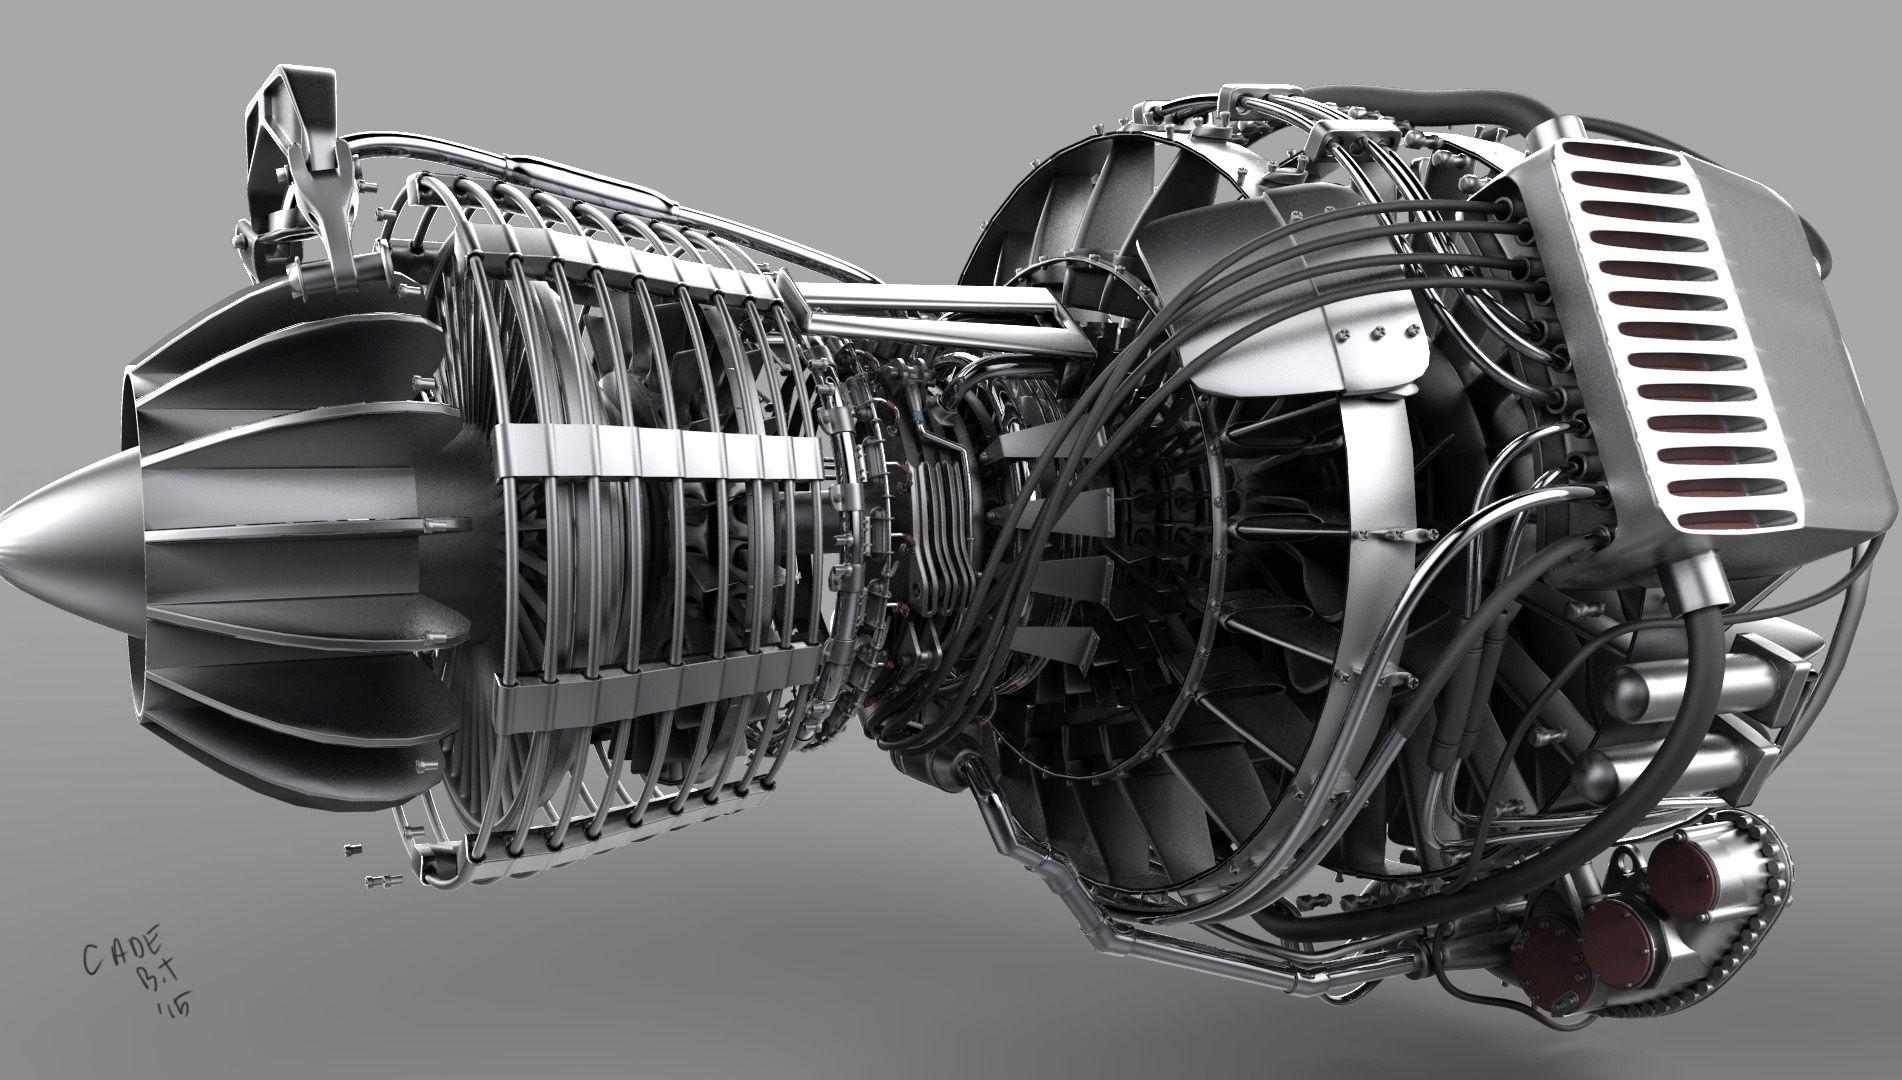 Turbofan Jet Engine Jet Engine Engineering Aircraft Design